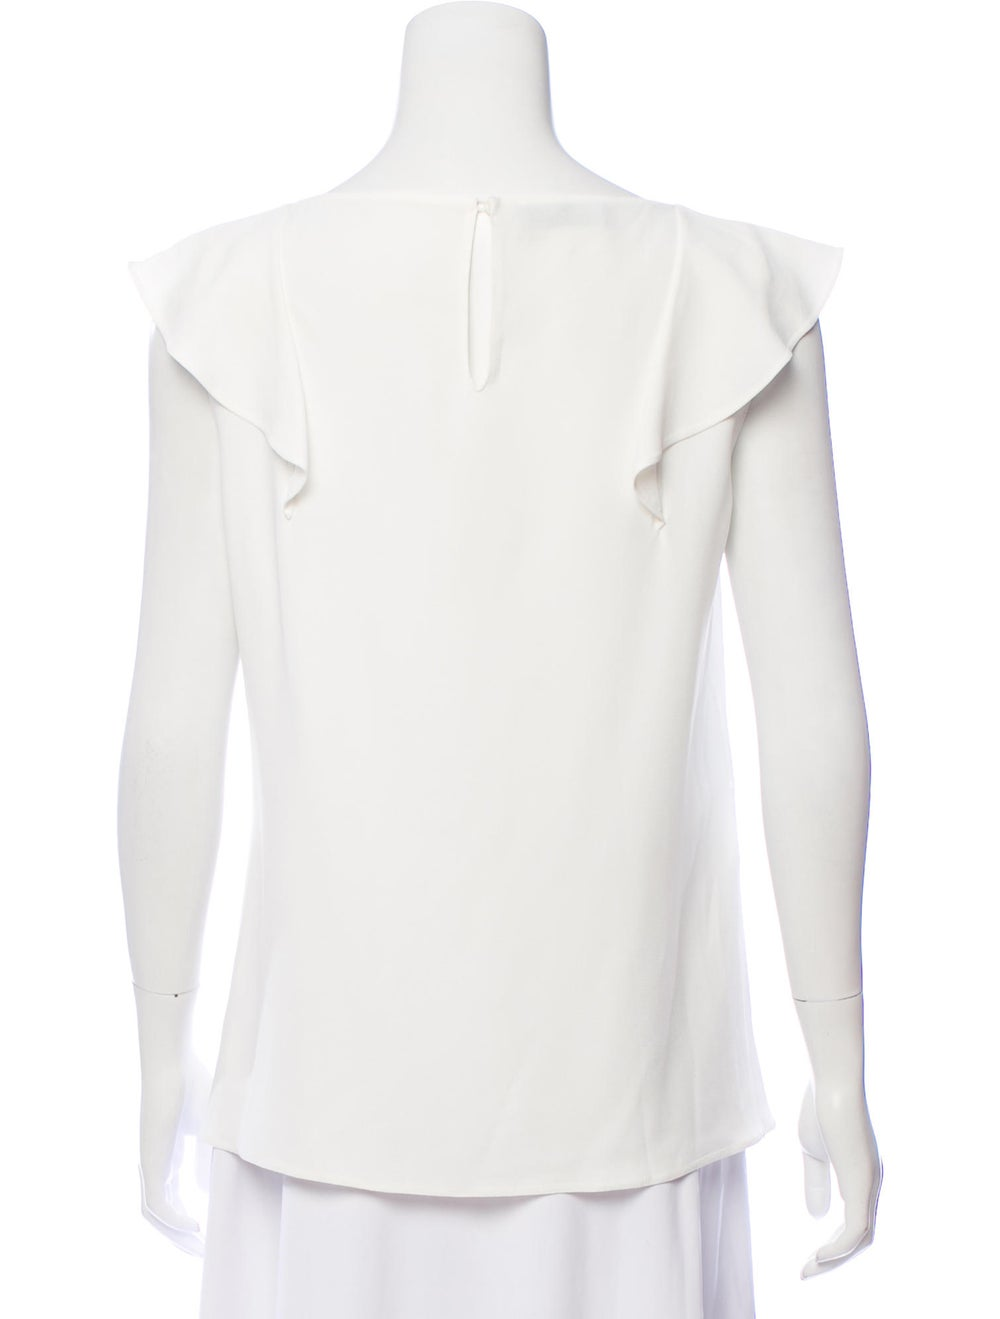 Prada Woven Ruffle-Accented Blouse White - image 3